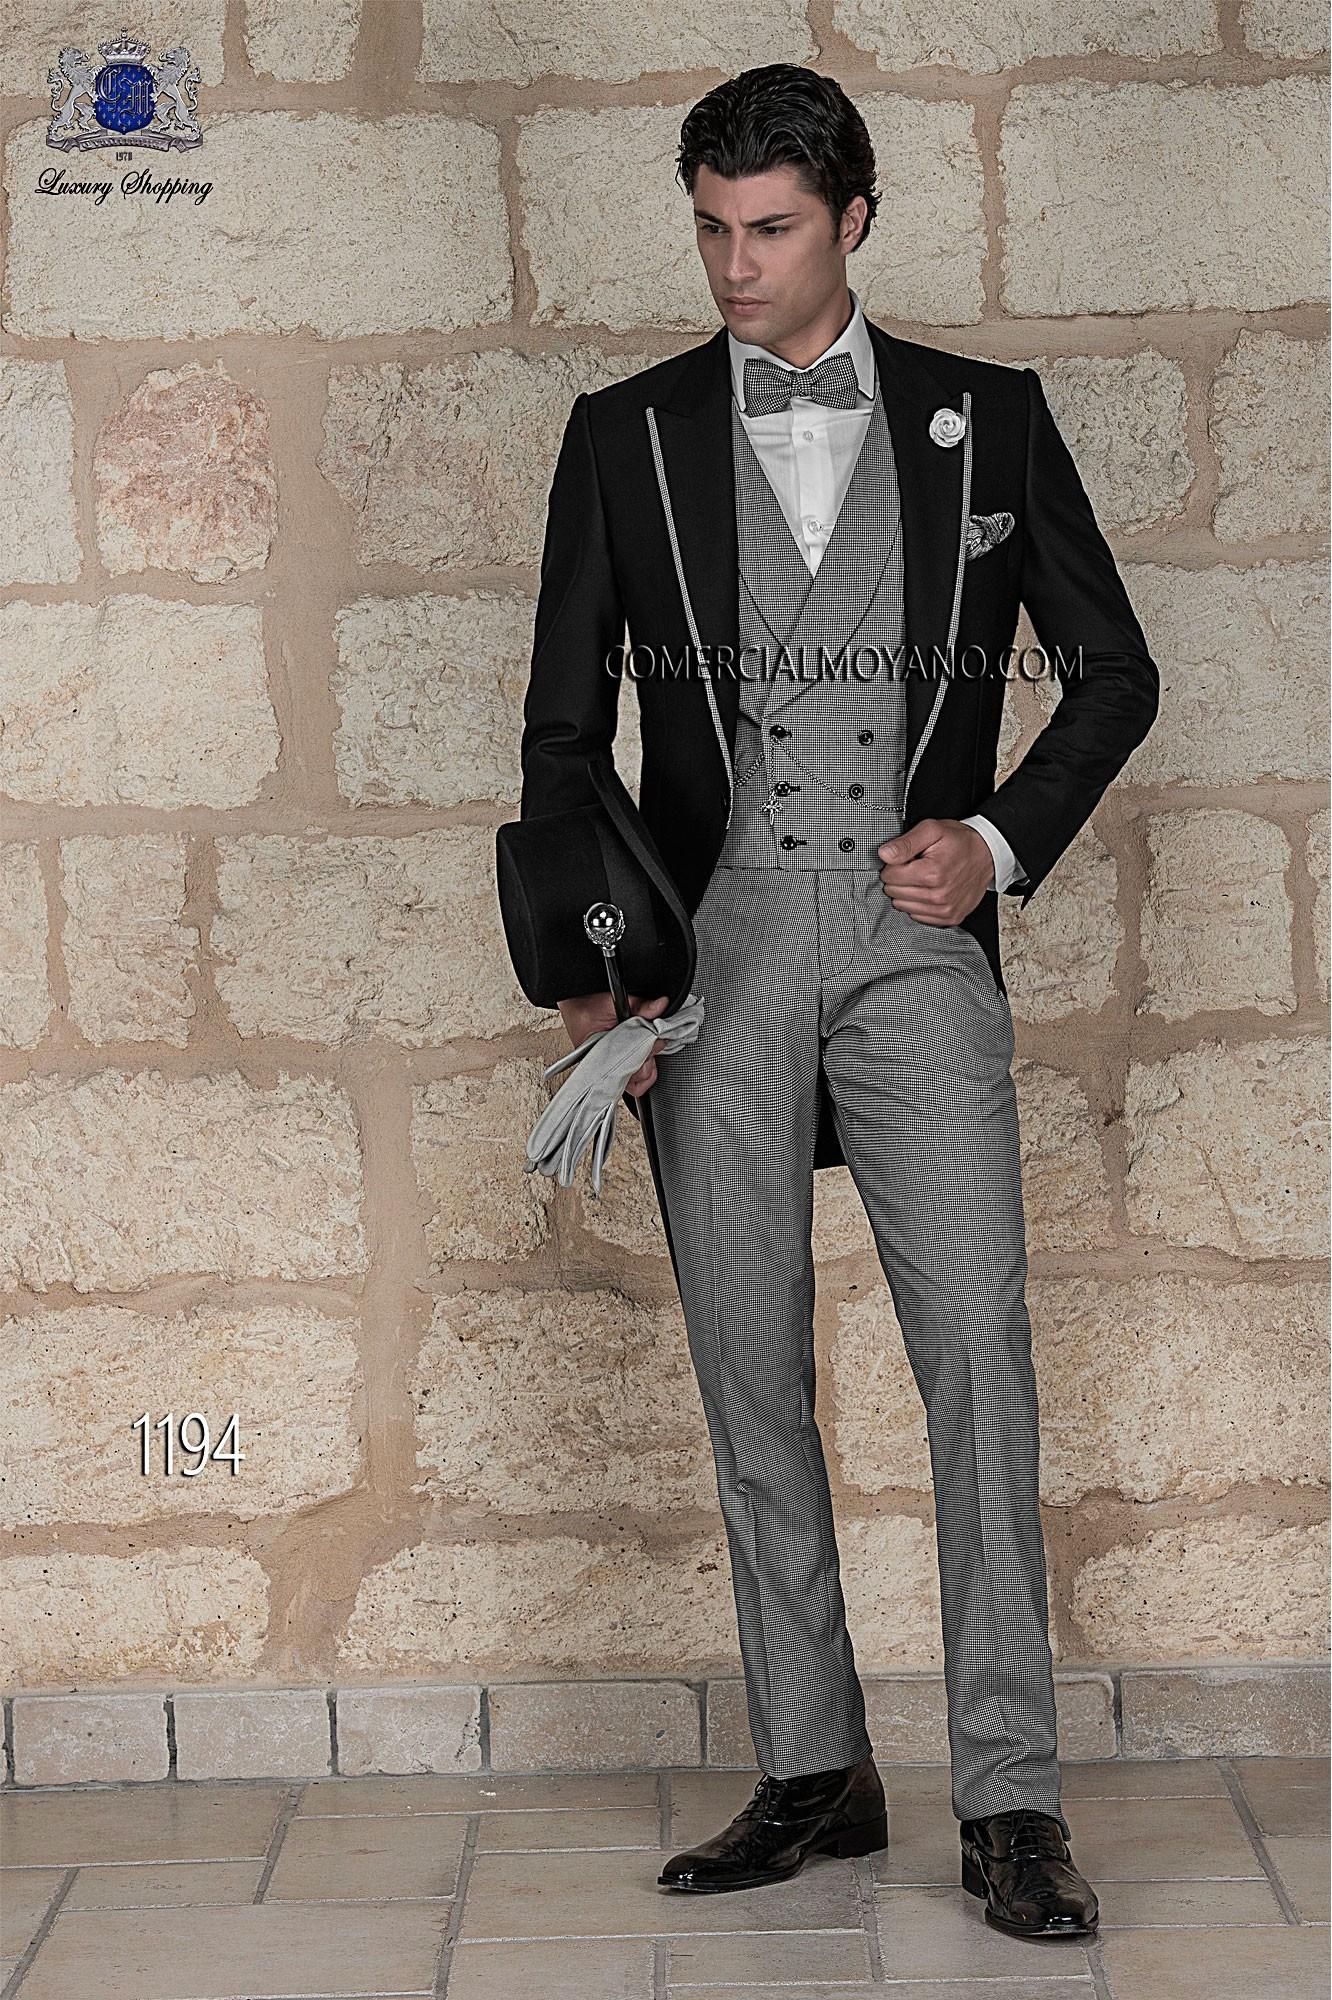 Gentleman black men wedding suit model 1194 Ottavio Nuccio Gala